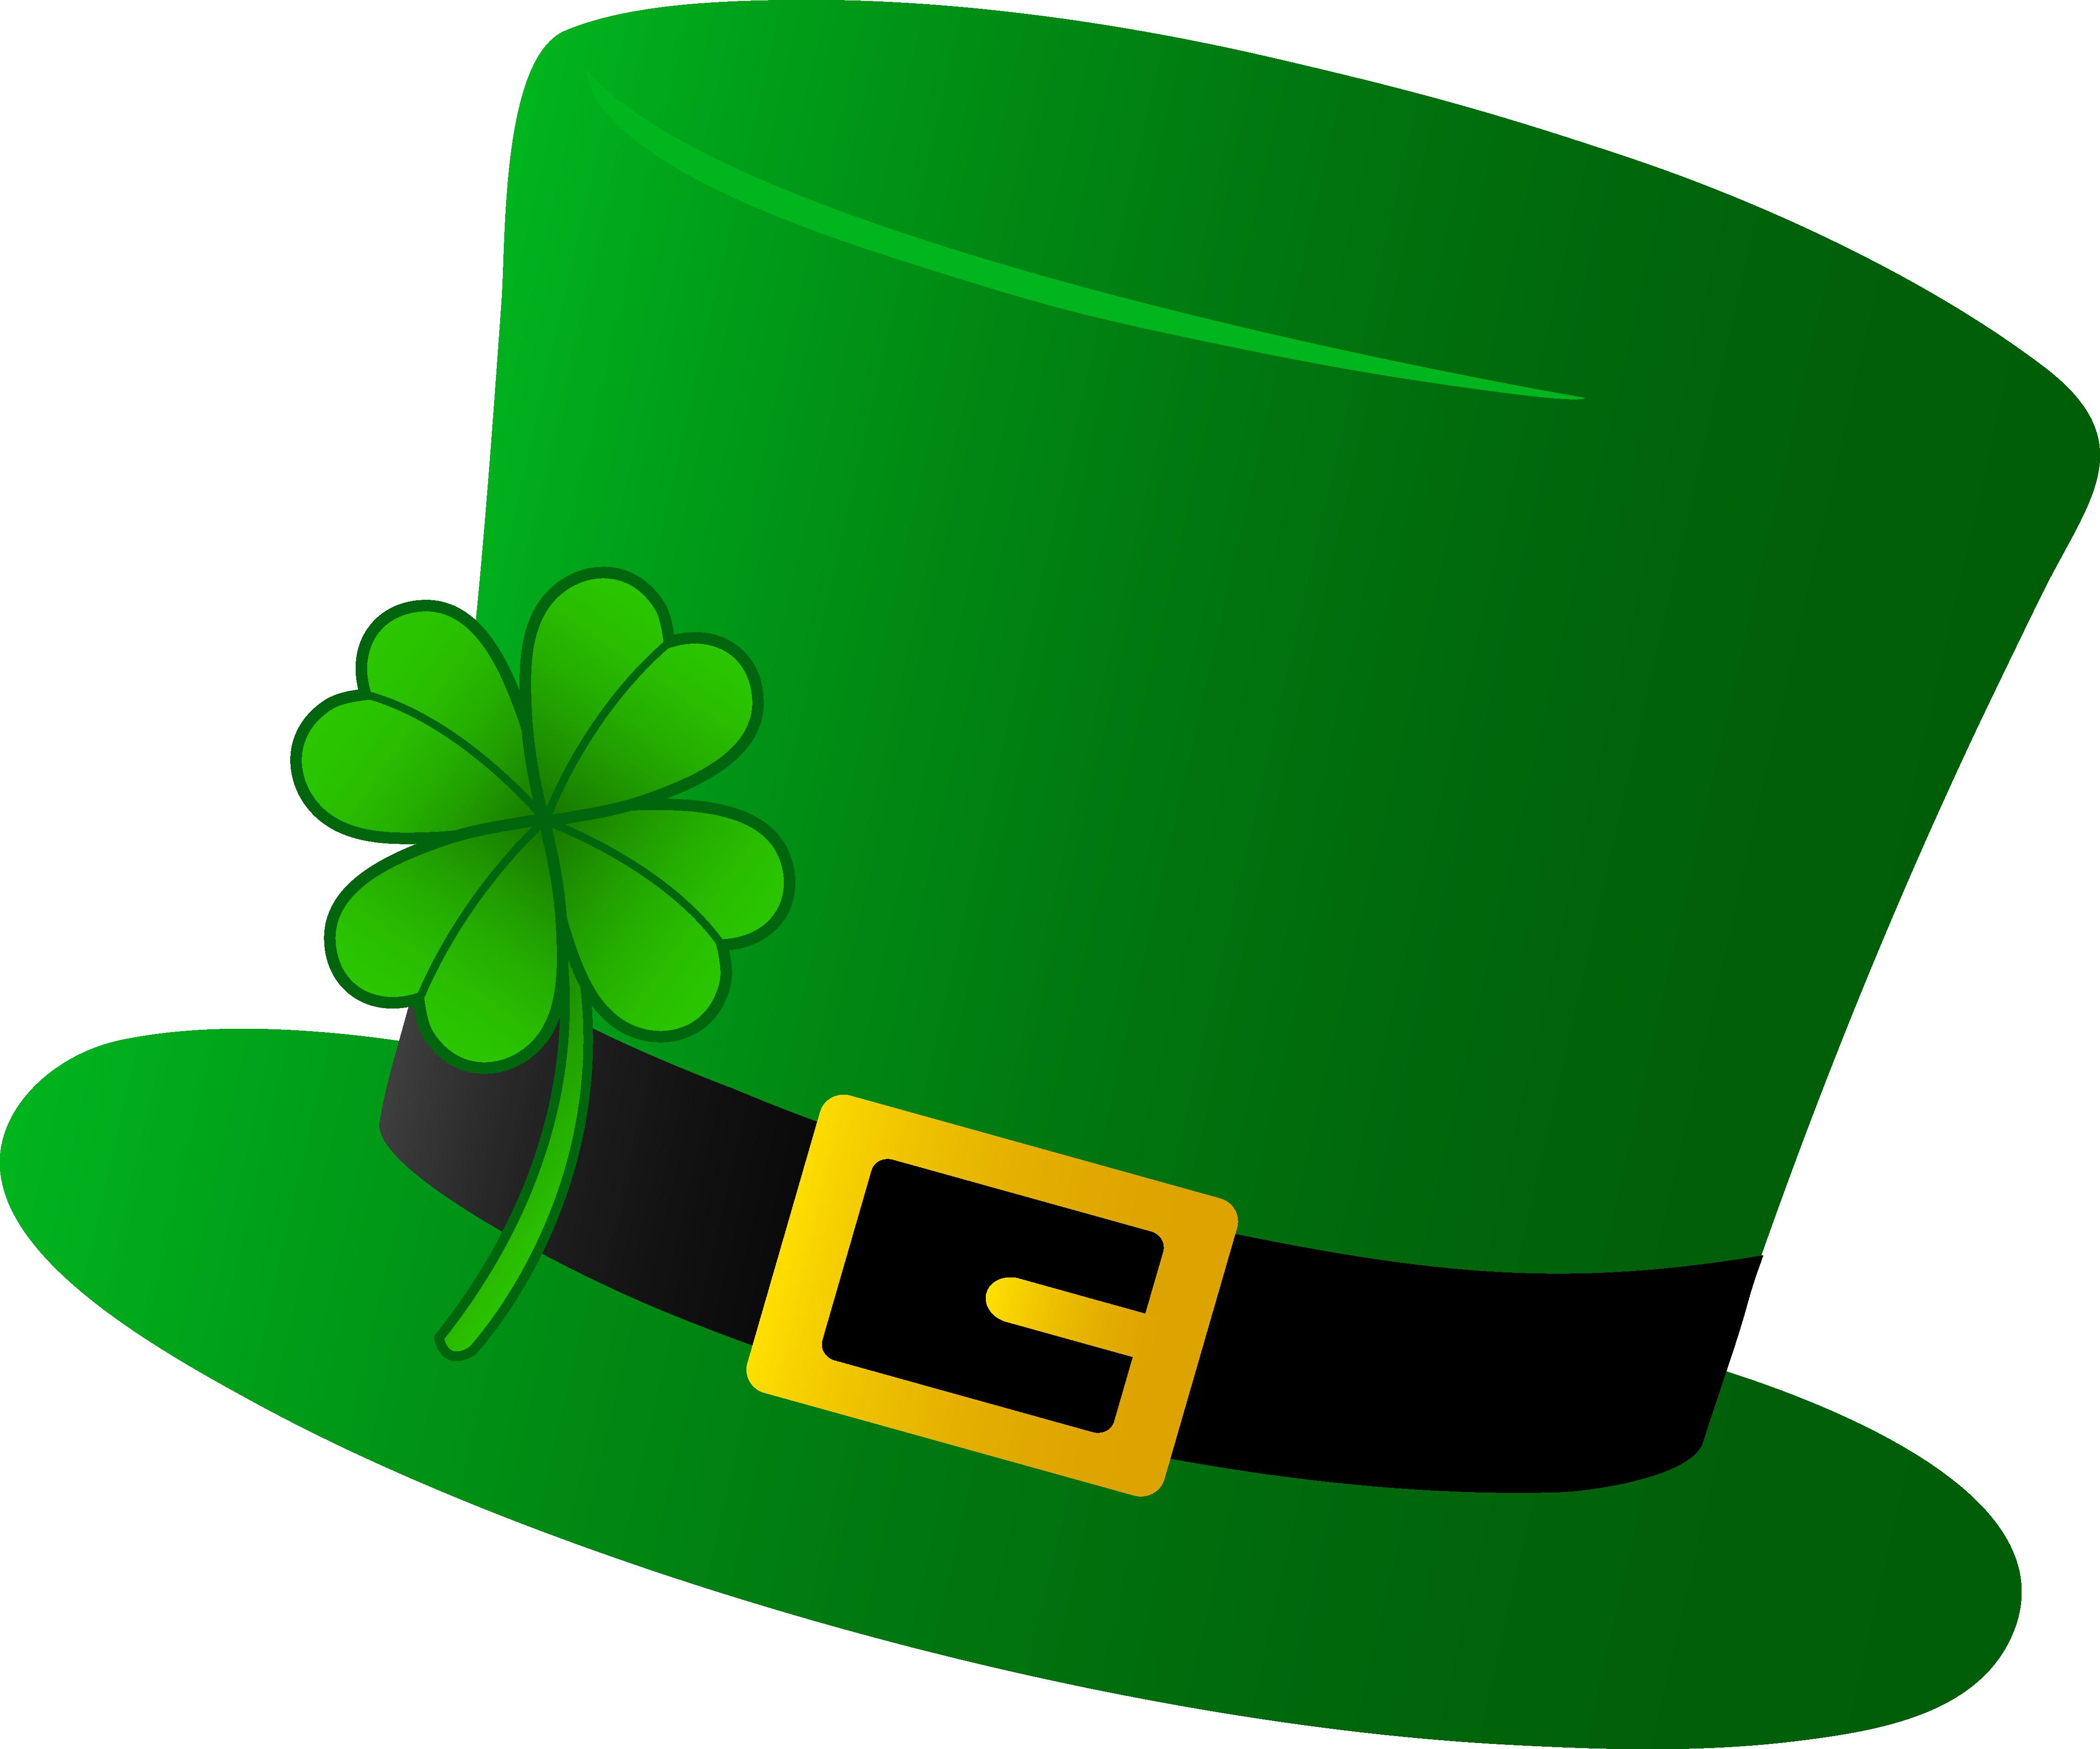 Free Saint Patricks Day Images, Download Free Clip Art, Free.